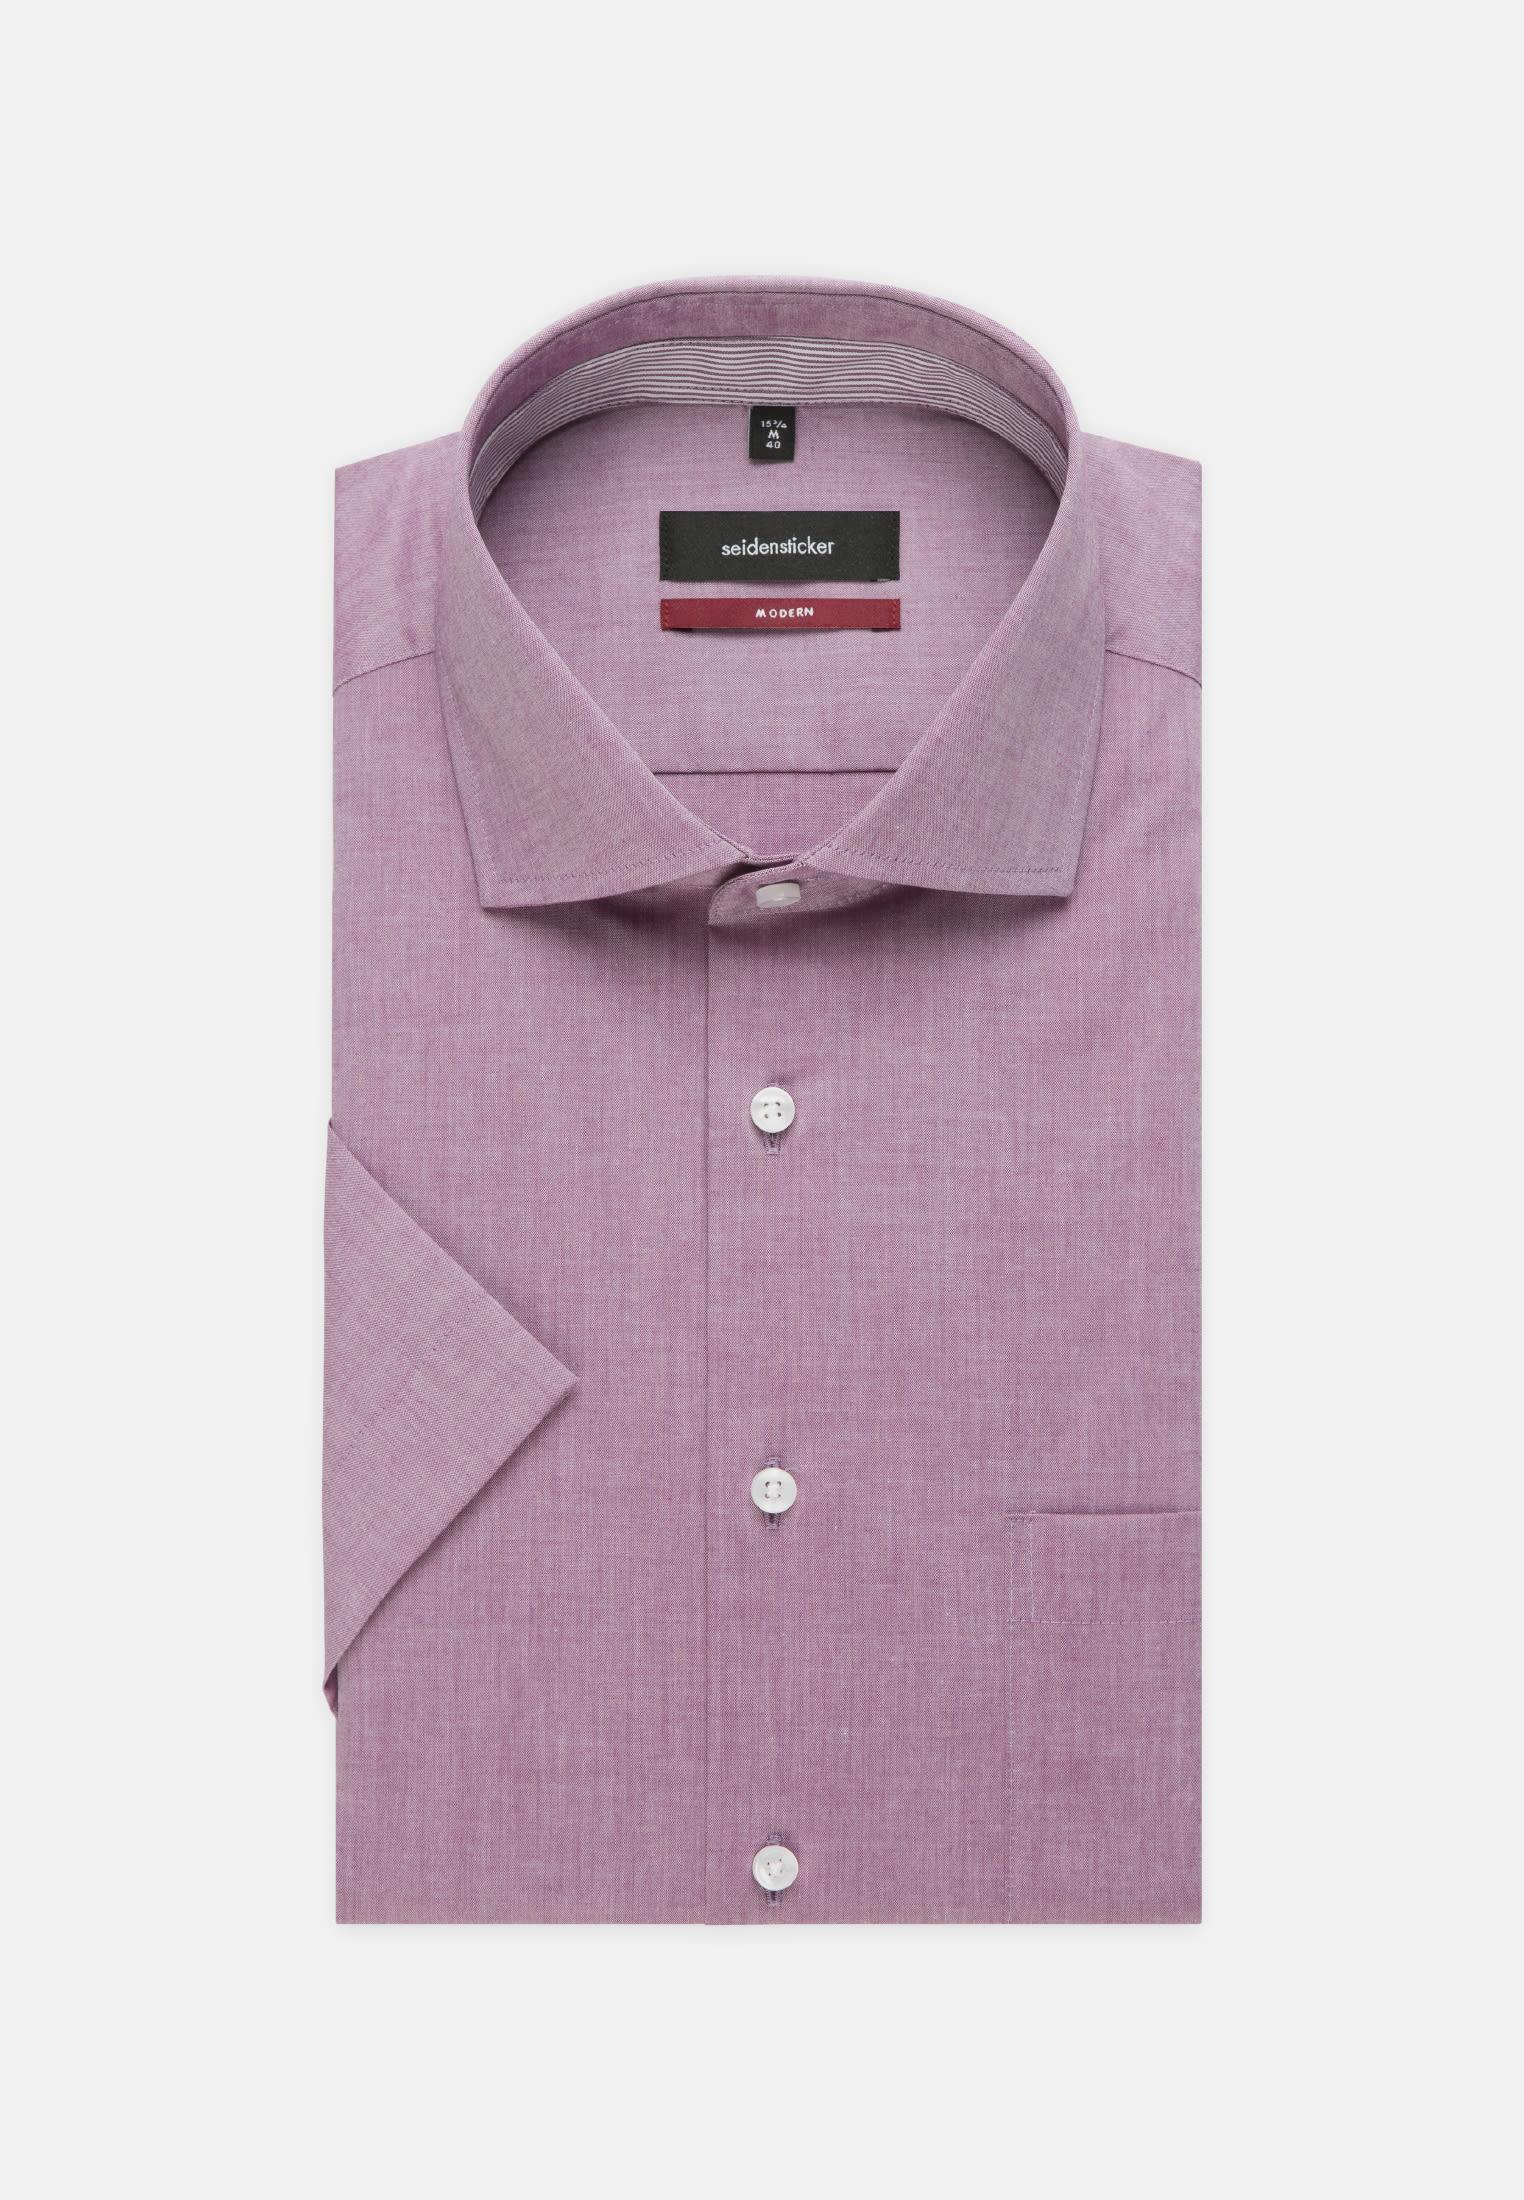 Bügelfreies Chambray Kurzarm Business Hemd in Regular mit Kentkragen in Lila |  Seidensticker Onlineshop